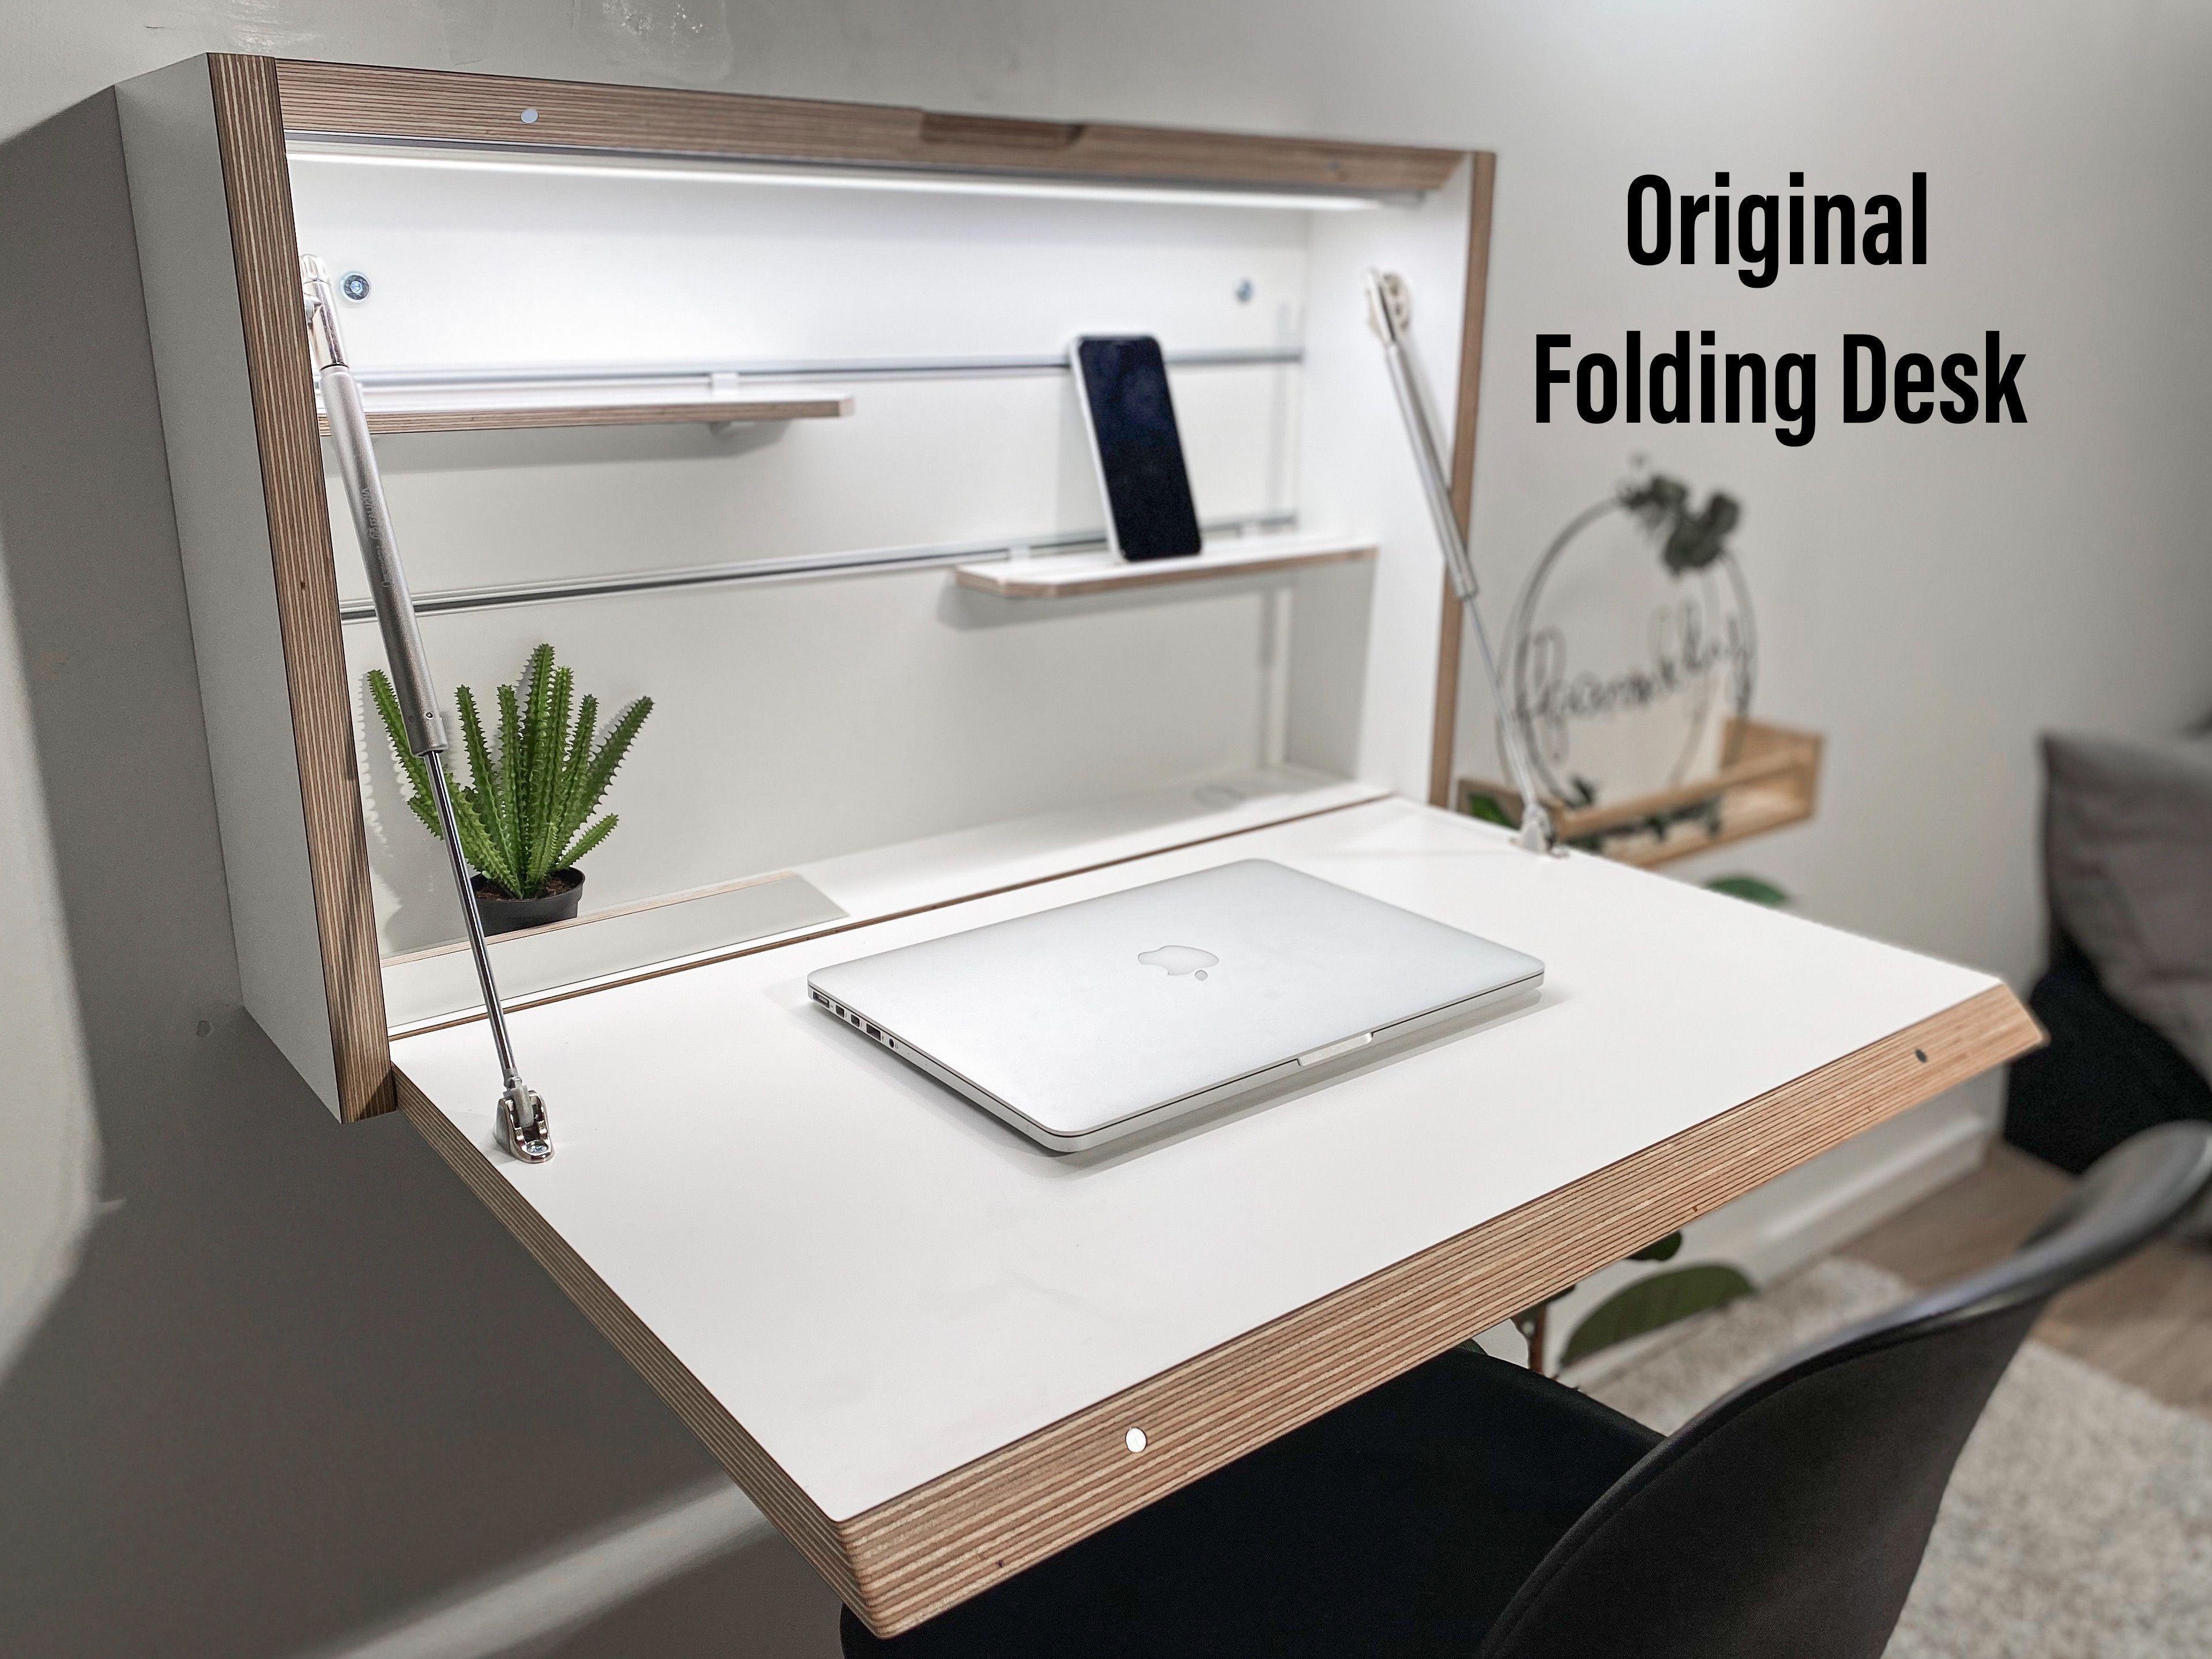 Wall Mounted Folding Desk Space Saving Desk Office Desk Etsy In 2020 Space Saving Desk Folding Desk Home Office Desks